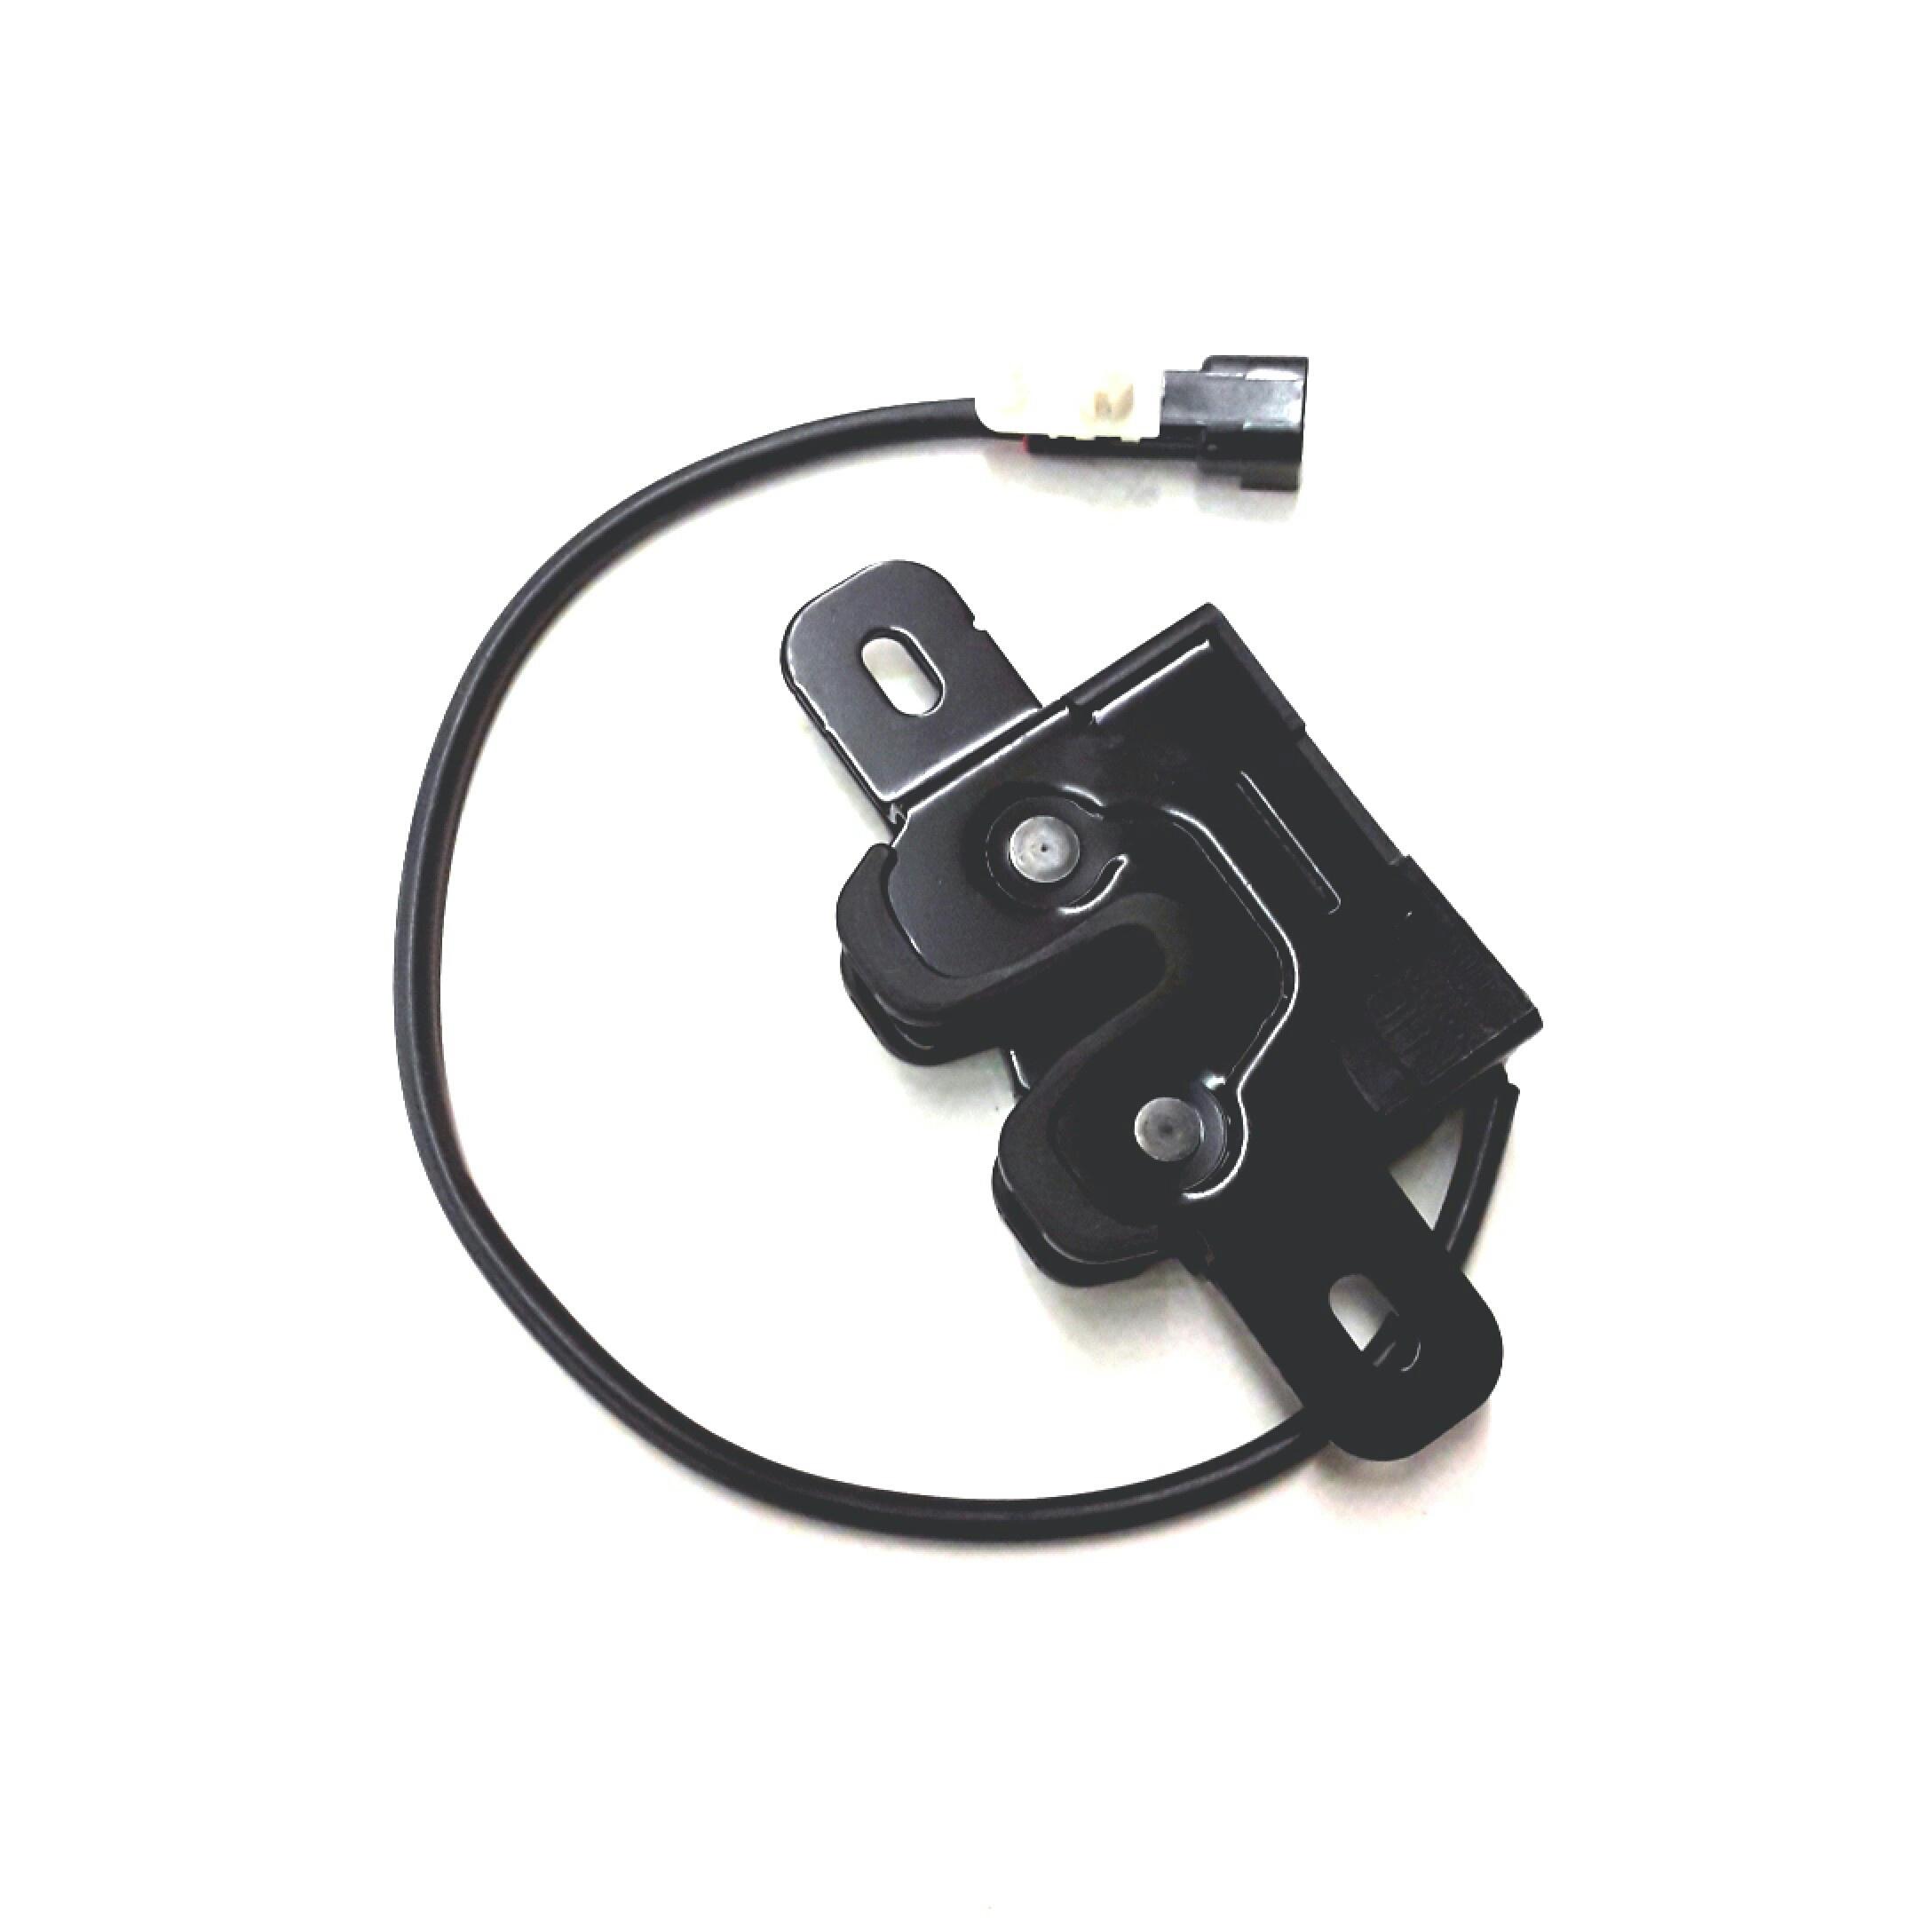 Volvo Xc70 Hood Lock Alarm Excl Il Right Parts